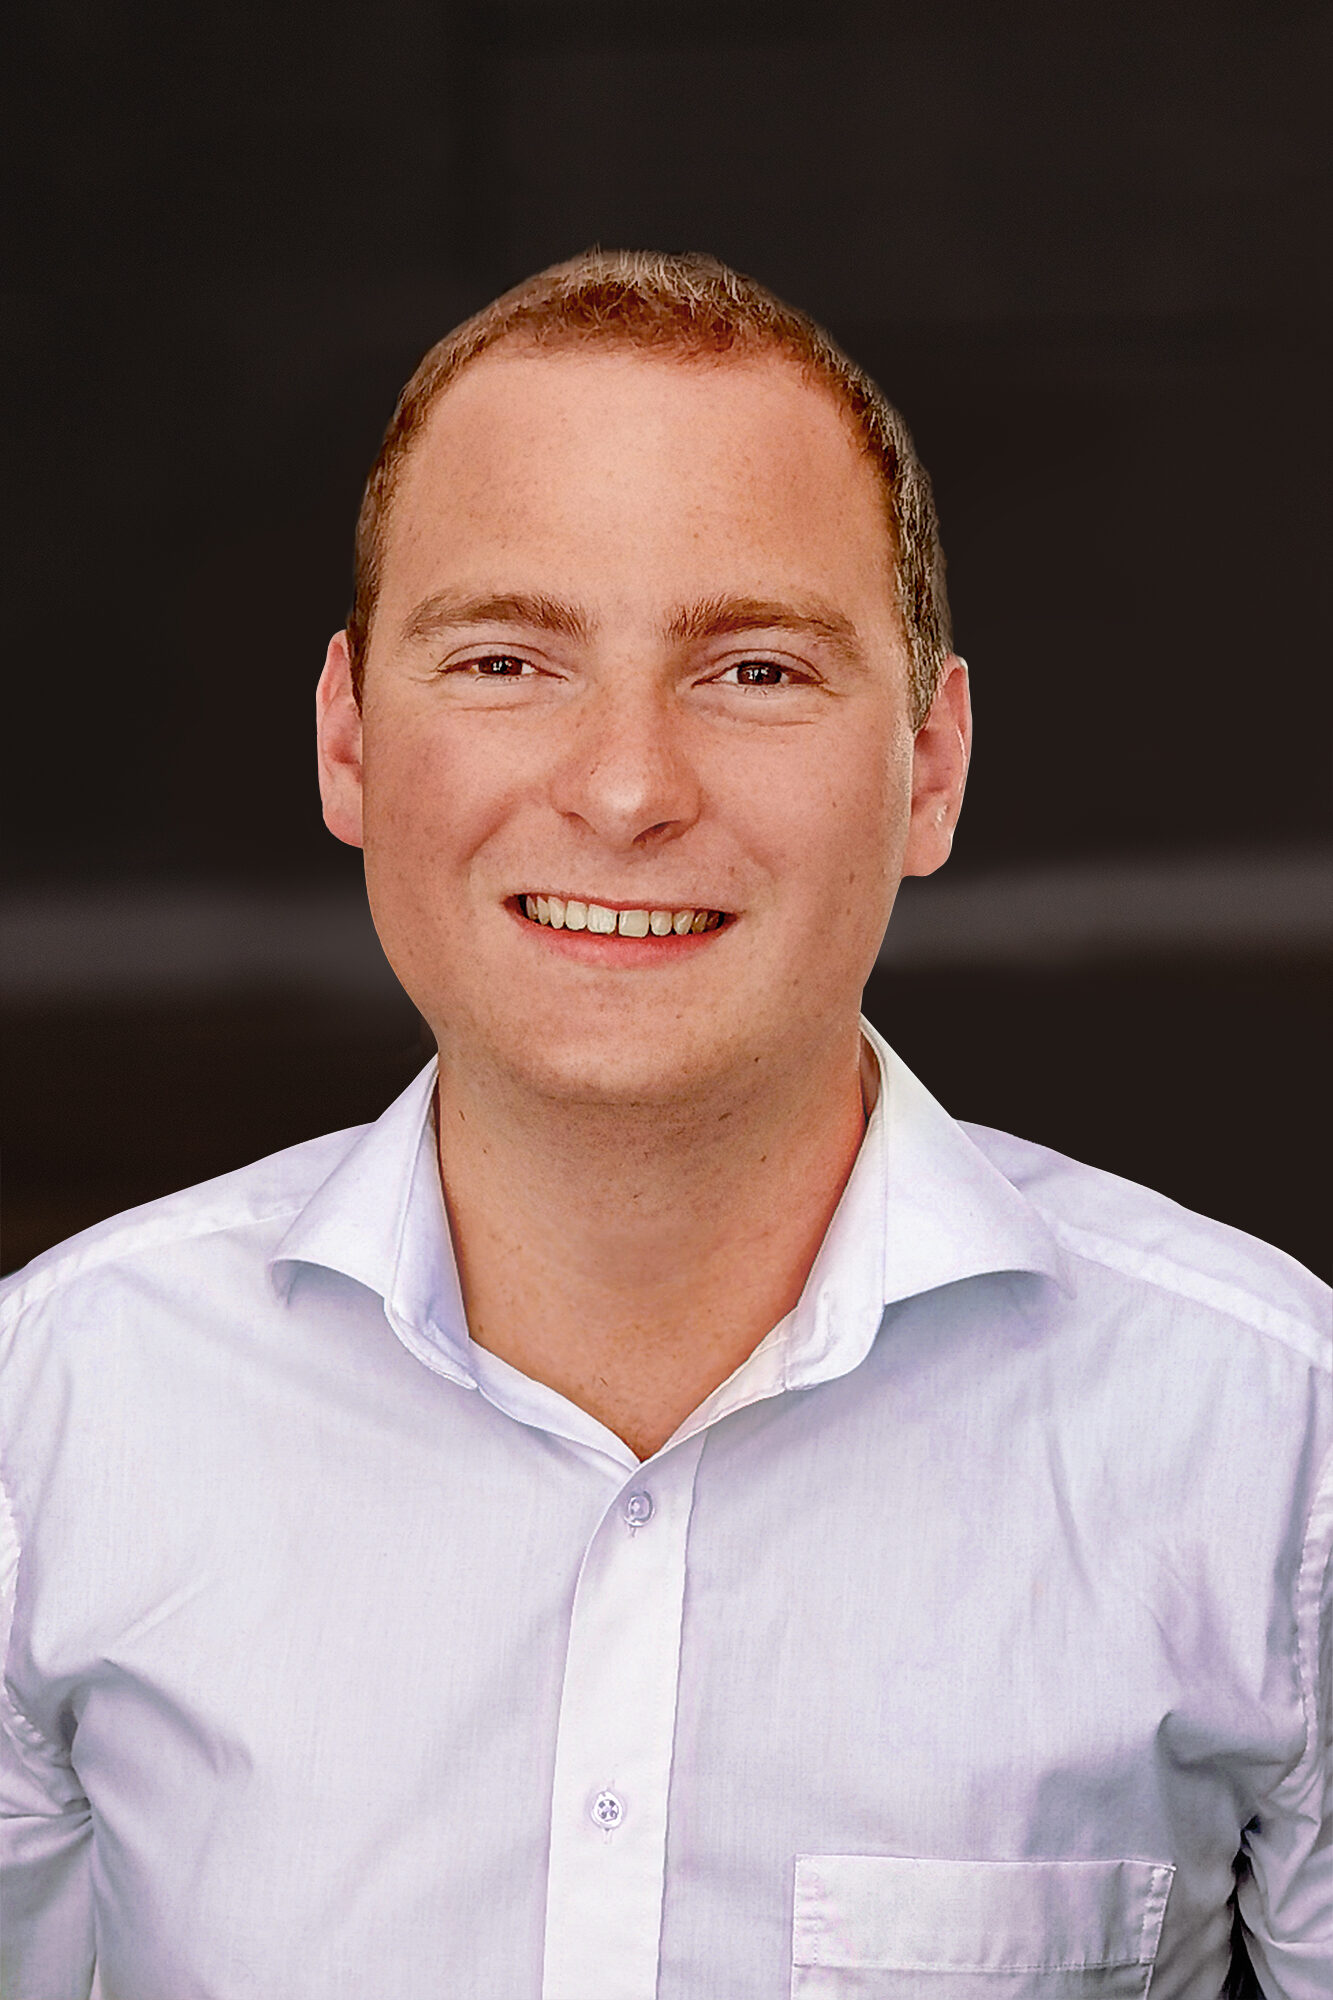 Mathias Maderthaner